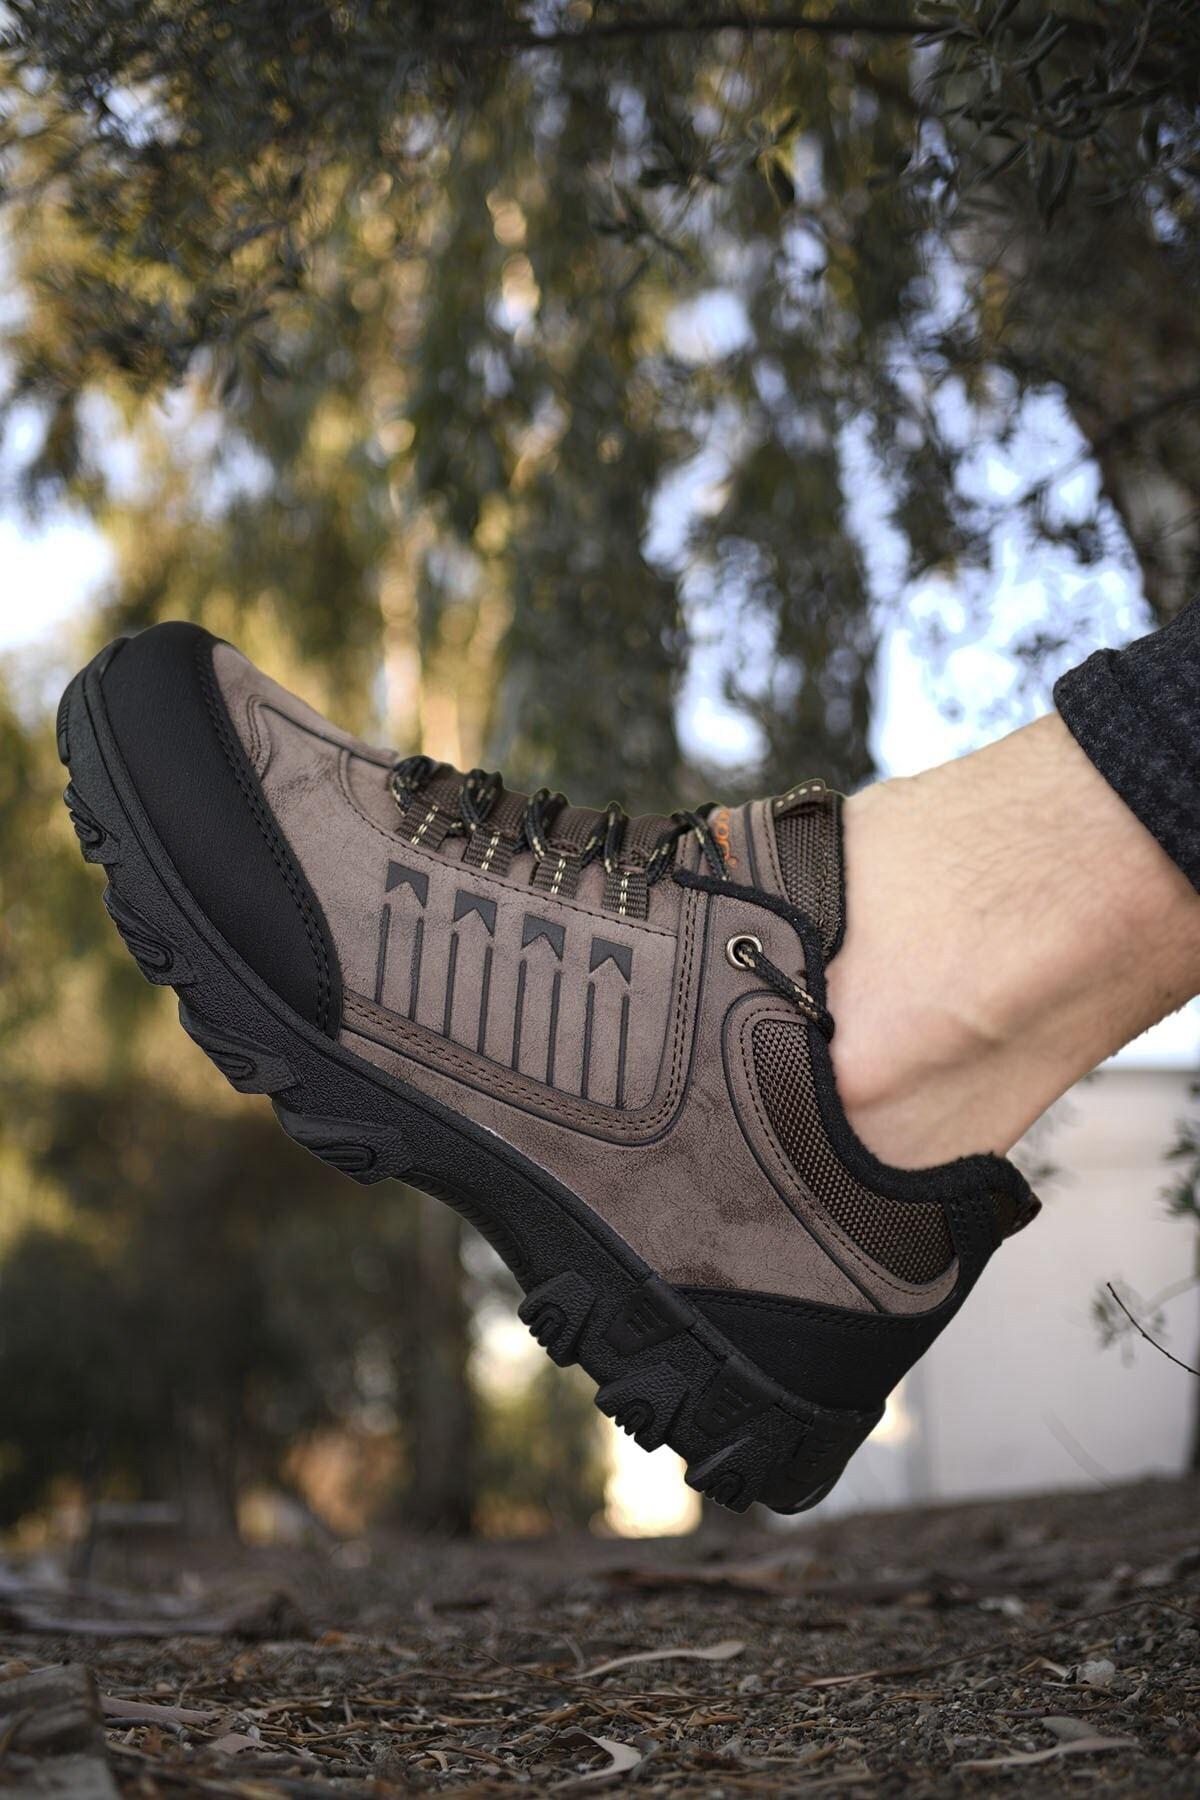 Riccon Kahverengi Siyah Erkek Trekking Ayakkabı 00121180 1